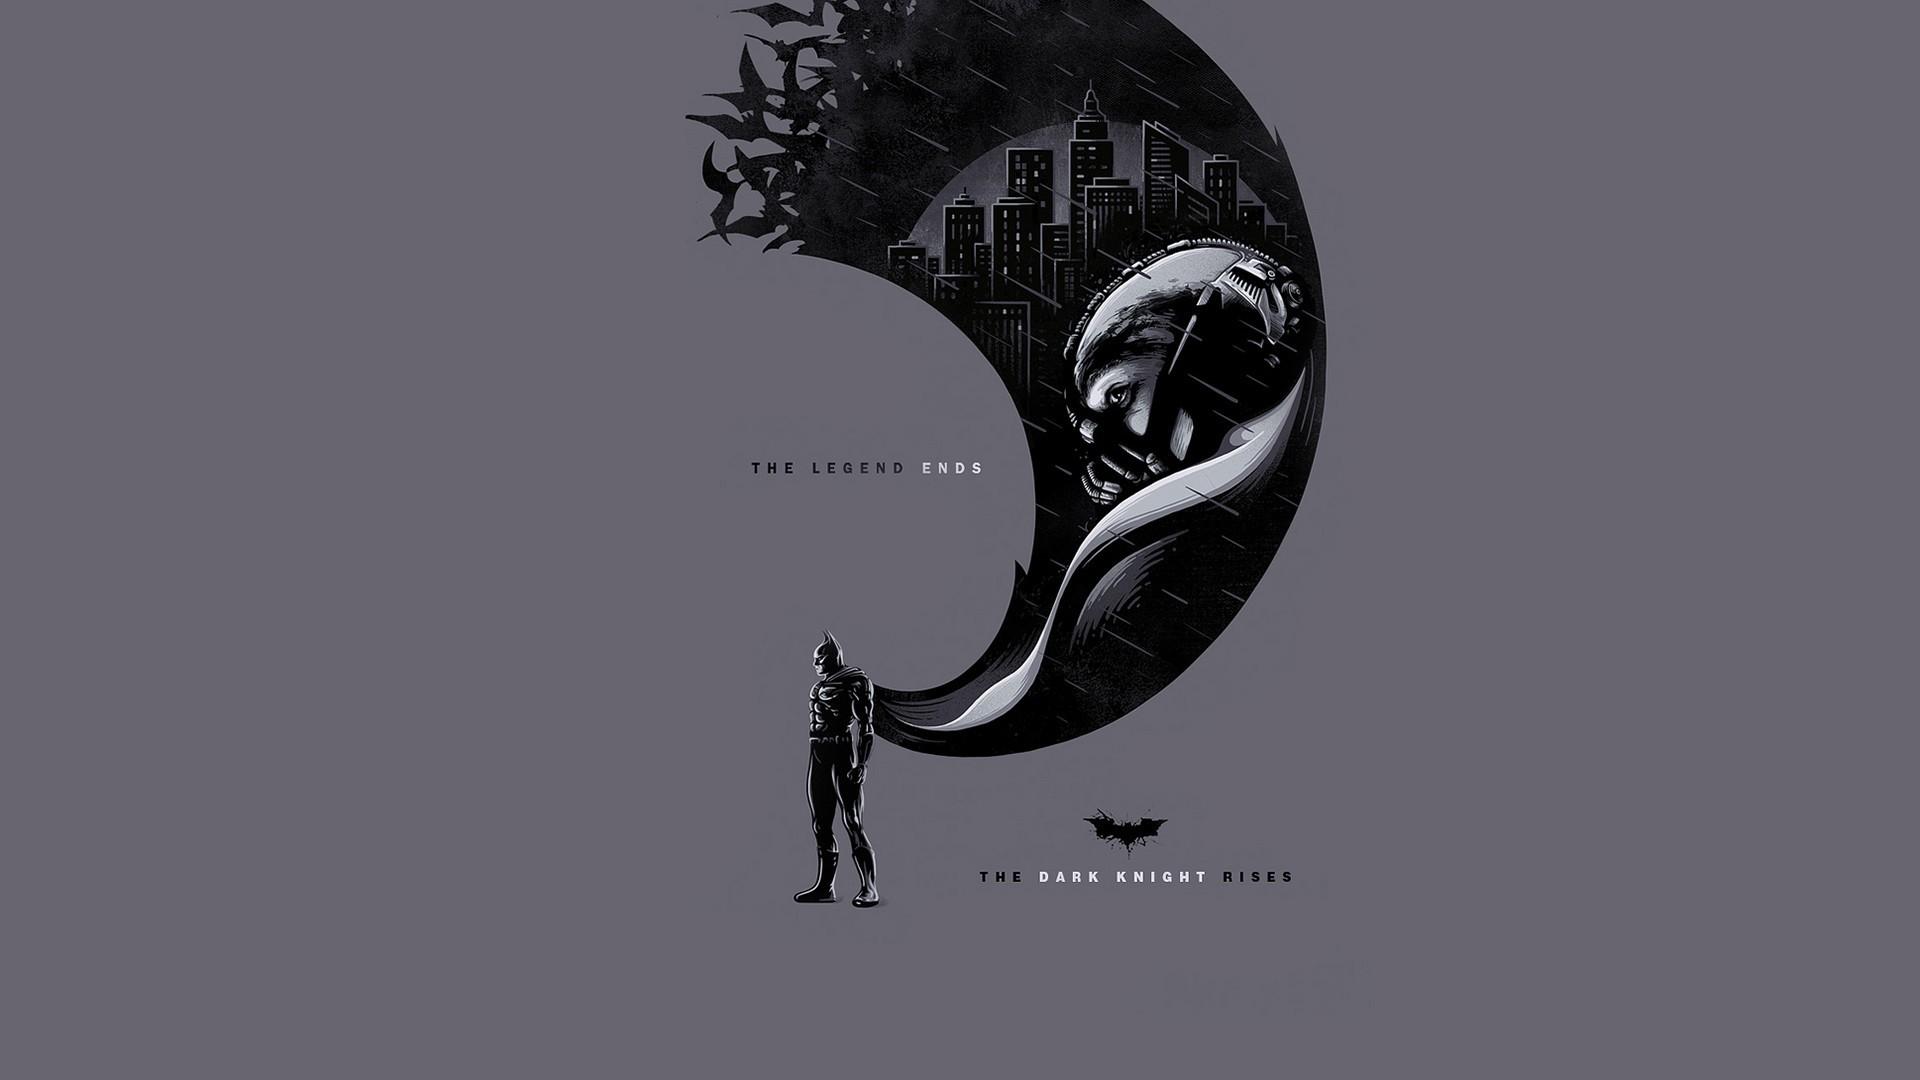 Batman The Dark Knight Rises wallpapers (81 Wallpapers) – HD Wallpapers